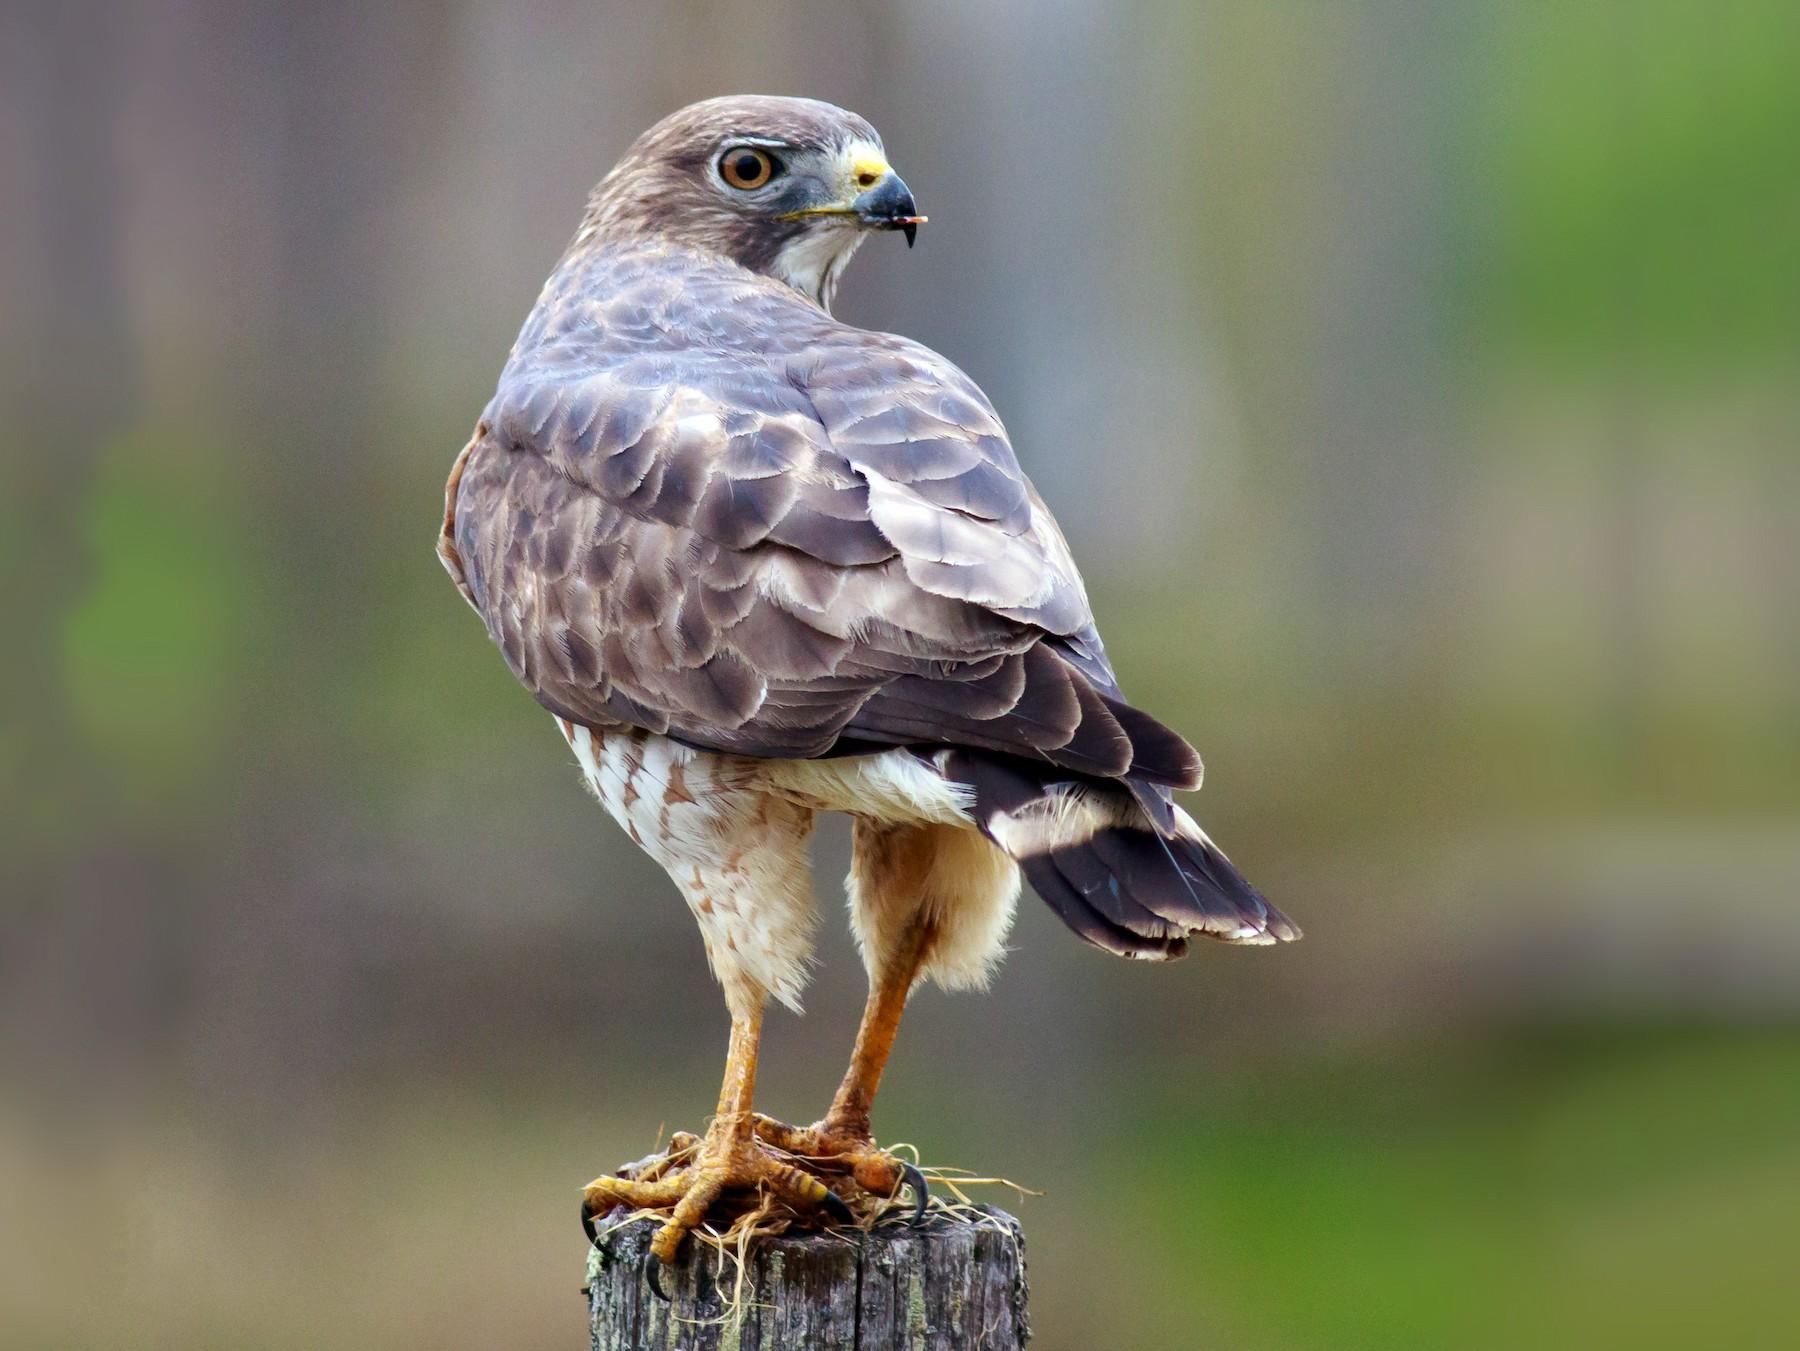 Broad-winged Hawk - andrew aldrich